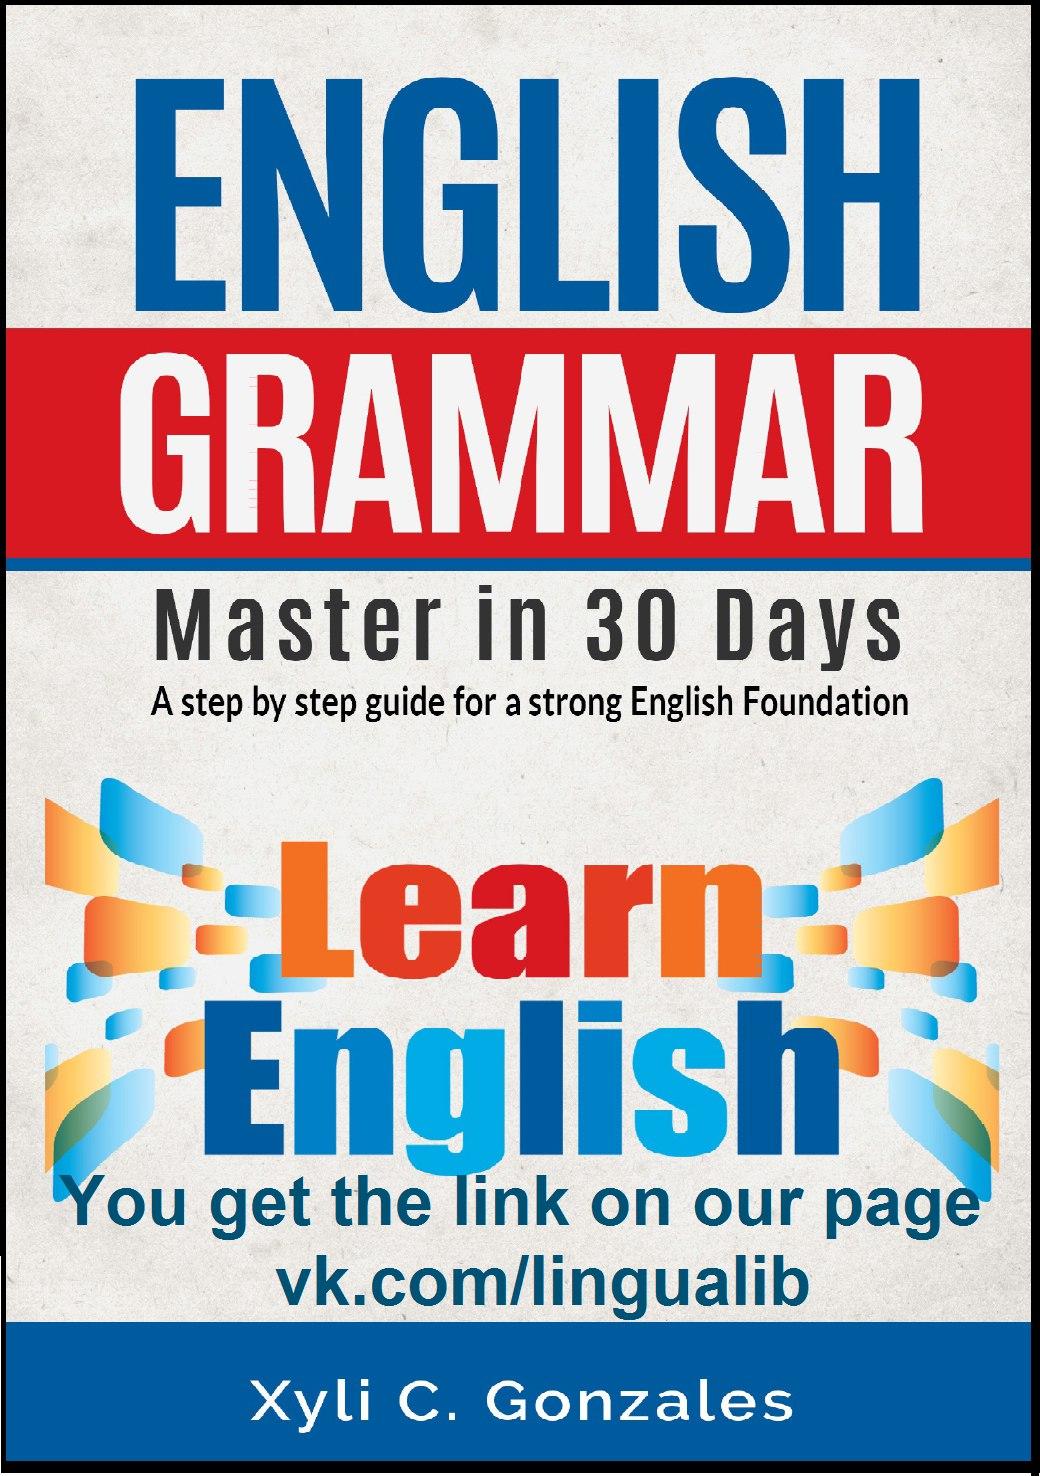 https://psv4.userapi.com/c834502/u243798239/docs/d8/f96ef75ffe39/English_Grammar_Master_in_30_Days_final_-_facebook_com_LinguaLIB.pdf?extra=fHWLRYpUnW7JNBRp5n3rw68xUdQF805X6YpTzWjbMB51yK4ShabTGPcPZlexE5Qj9ie7-2JAVuSL3xzrifAewWh7uL0sW5Fi3RzE7QWMtjLtlHqezb1wKCvY1x3w2yvIElGETpP9hsDp7aoFFA&dl=1